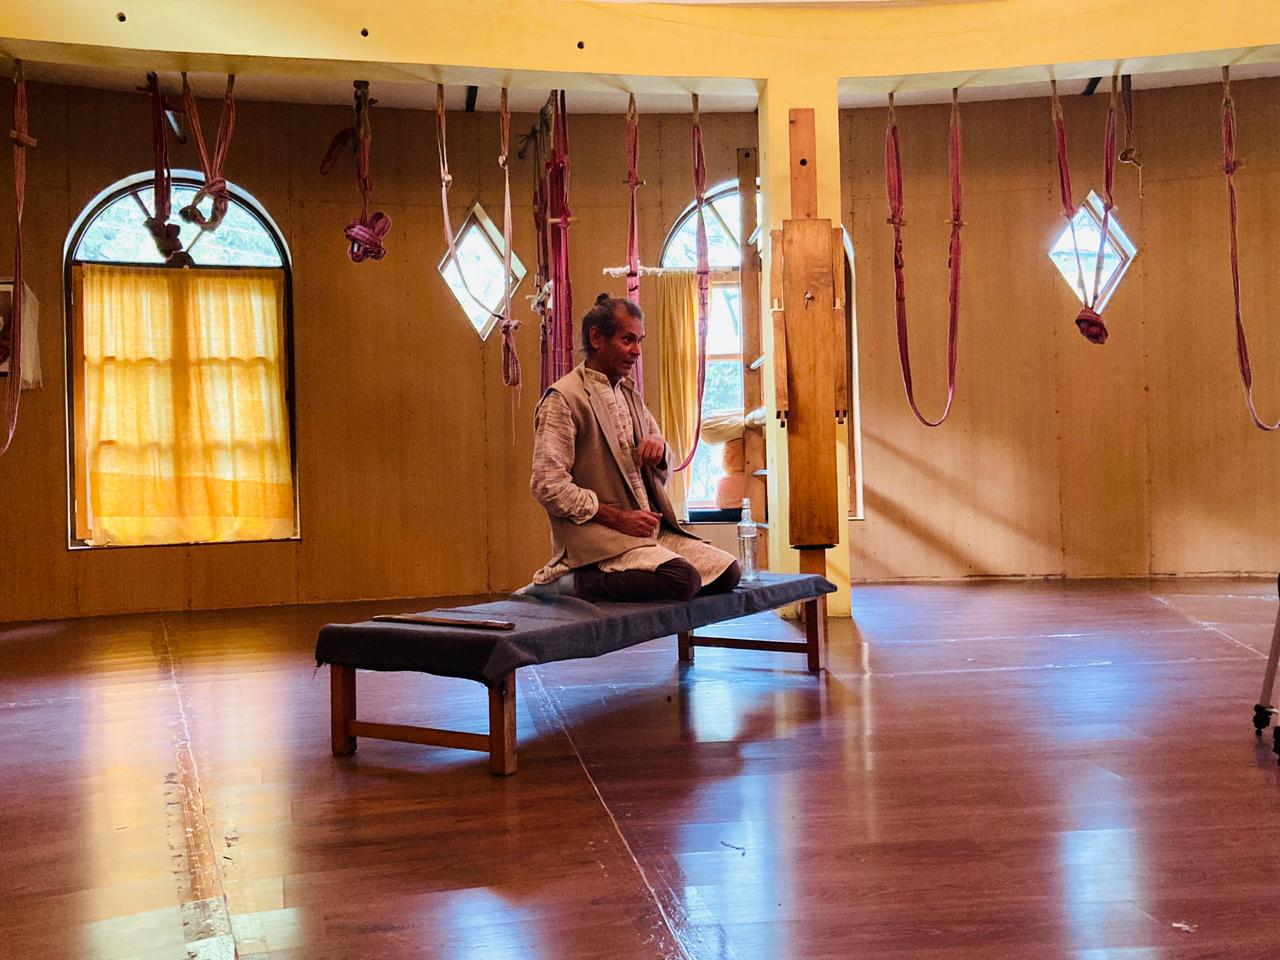 Yoga has been practised as a way to grow spiritually: Sharat Arora